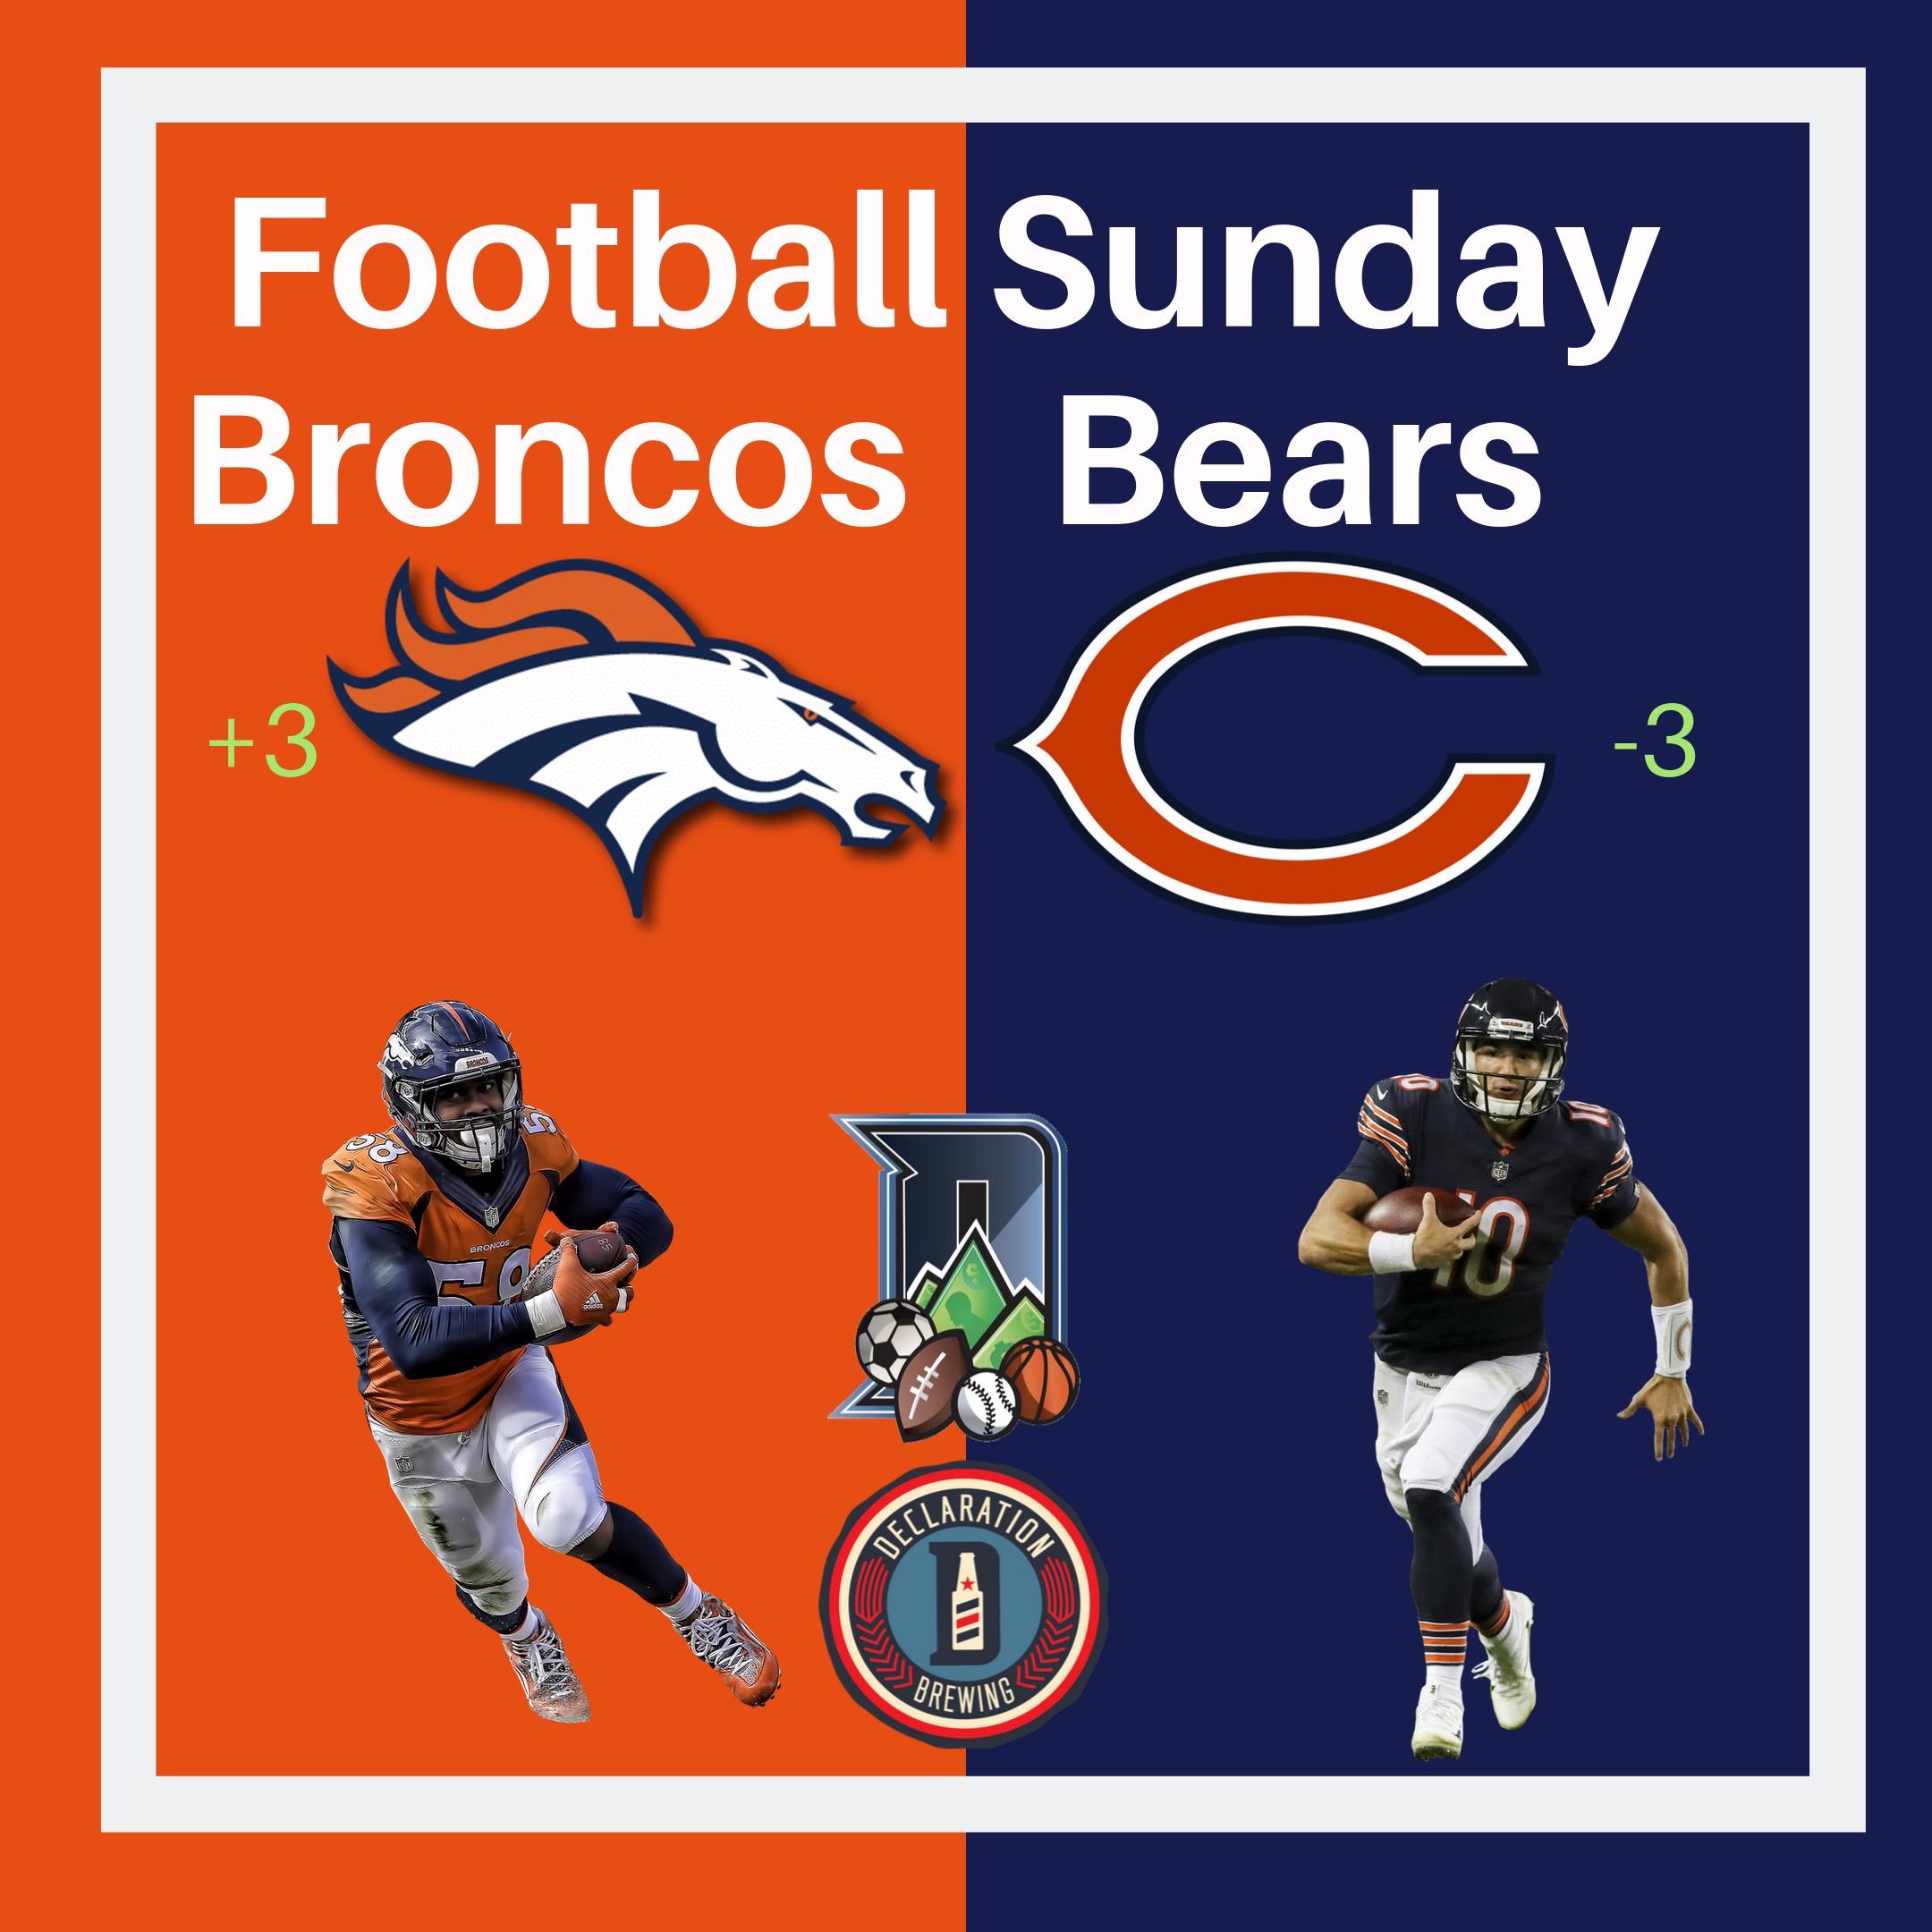 Broncos versus Bears at Declaration Brewery